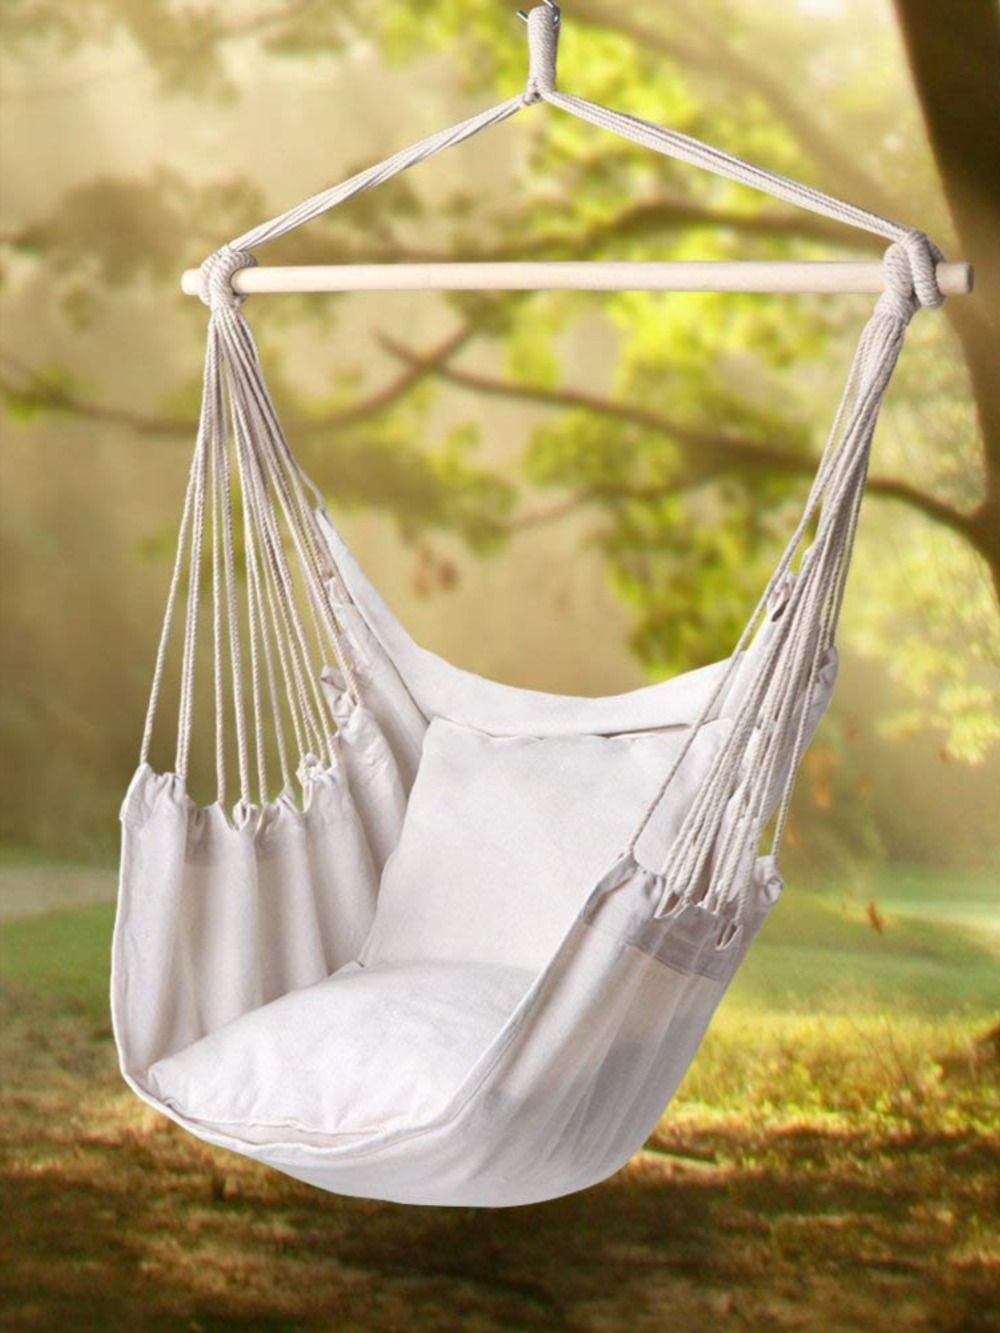 Handmade Hammock Chair With Macrame Edge Cotton Beige Outdoor Hammock Chair Hammock Swing Chair Hammock Swing